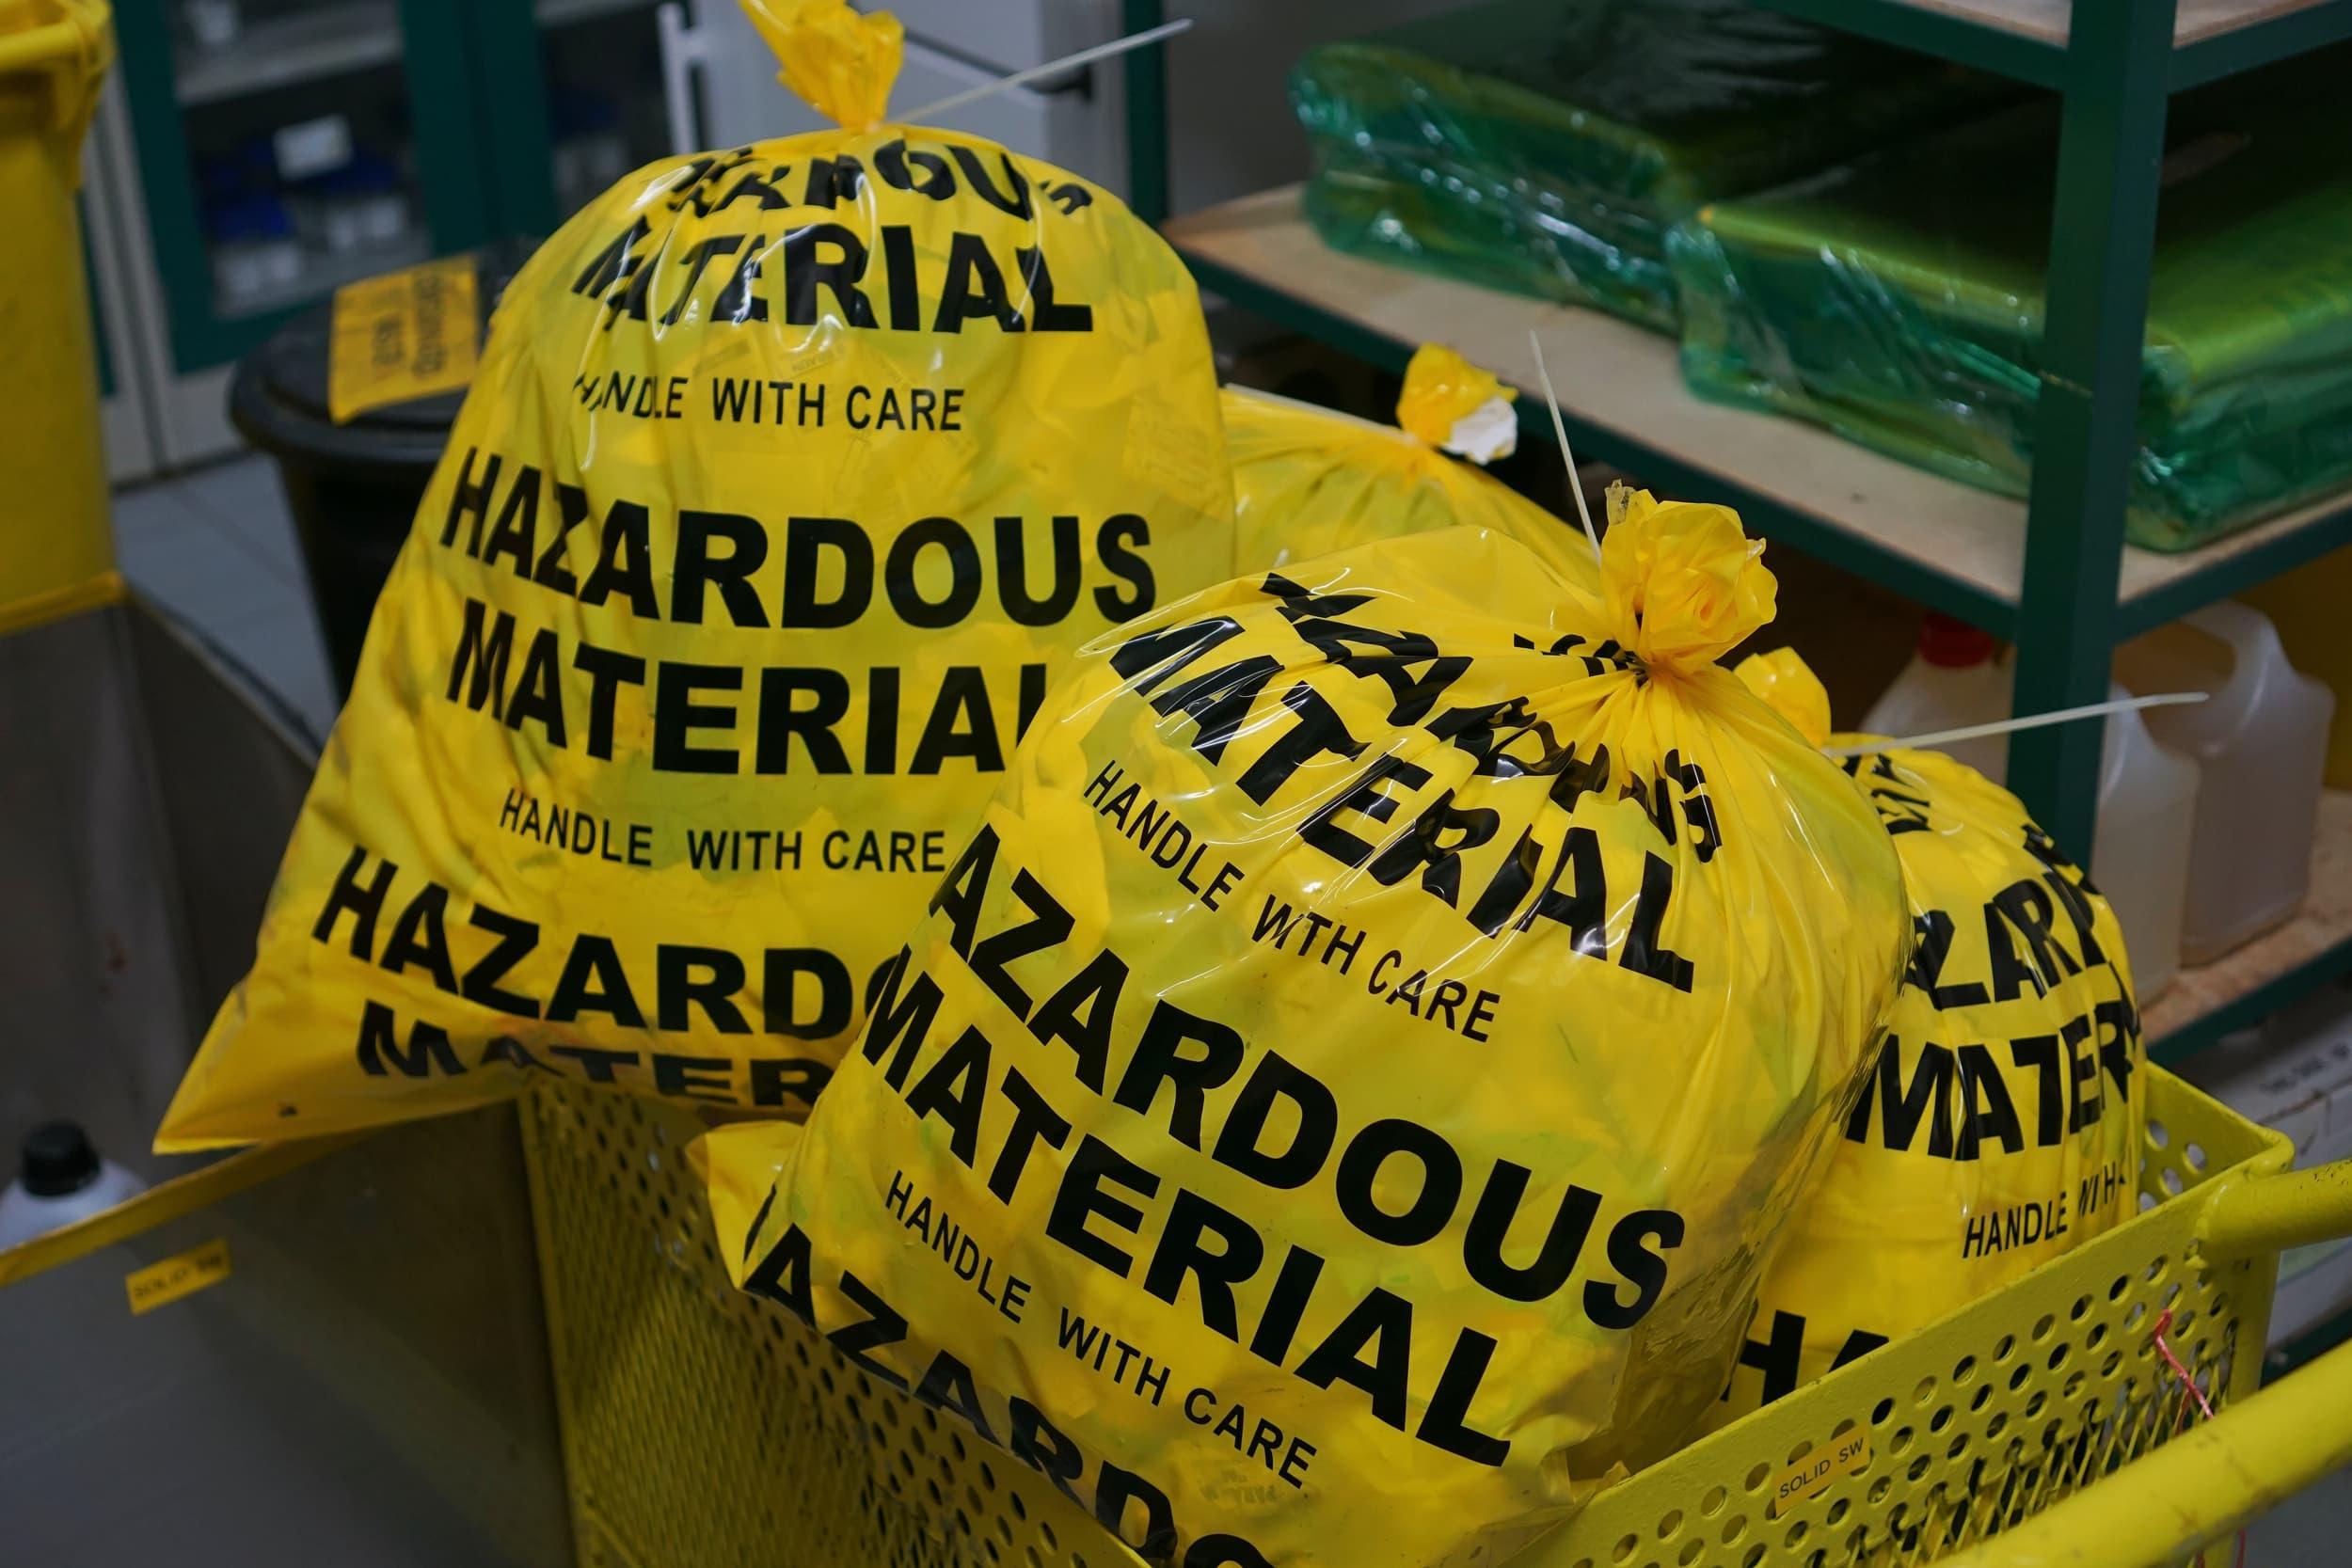 Compliance Training Online Hazardous Waste Safety course